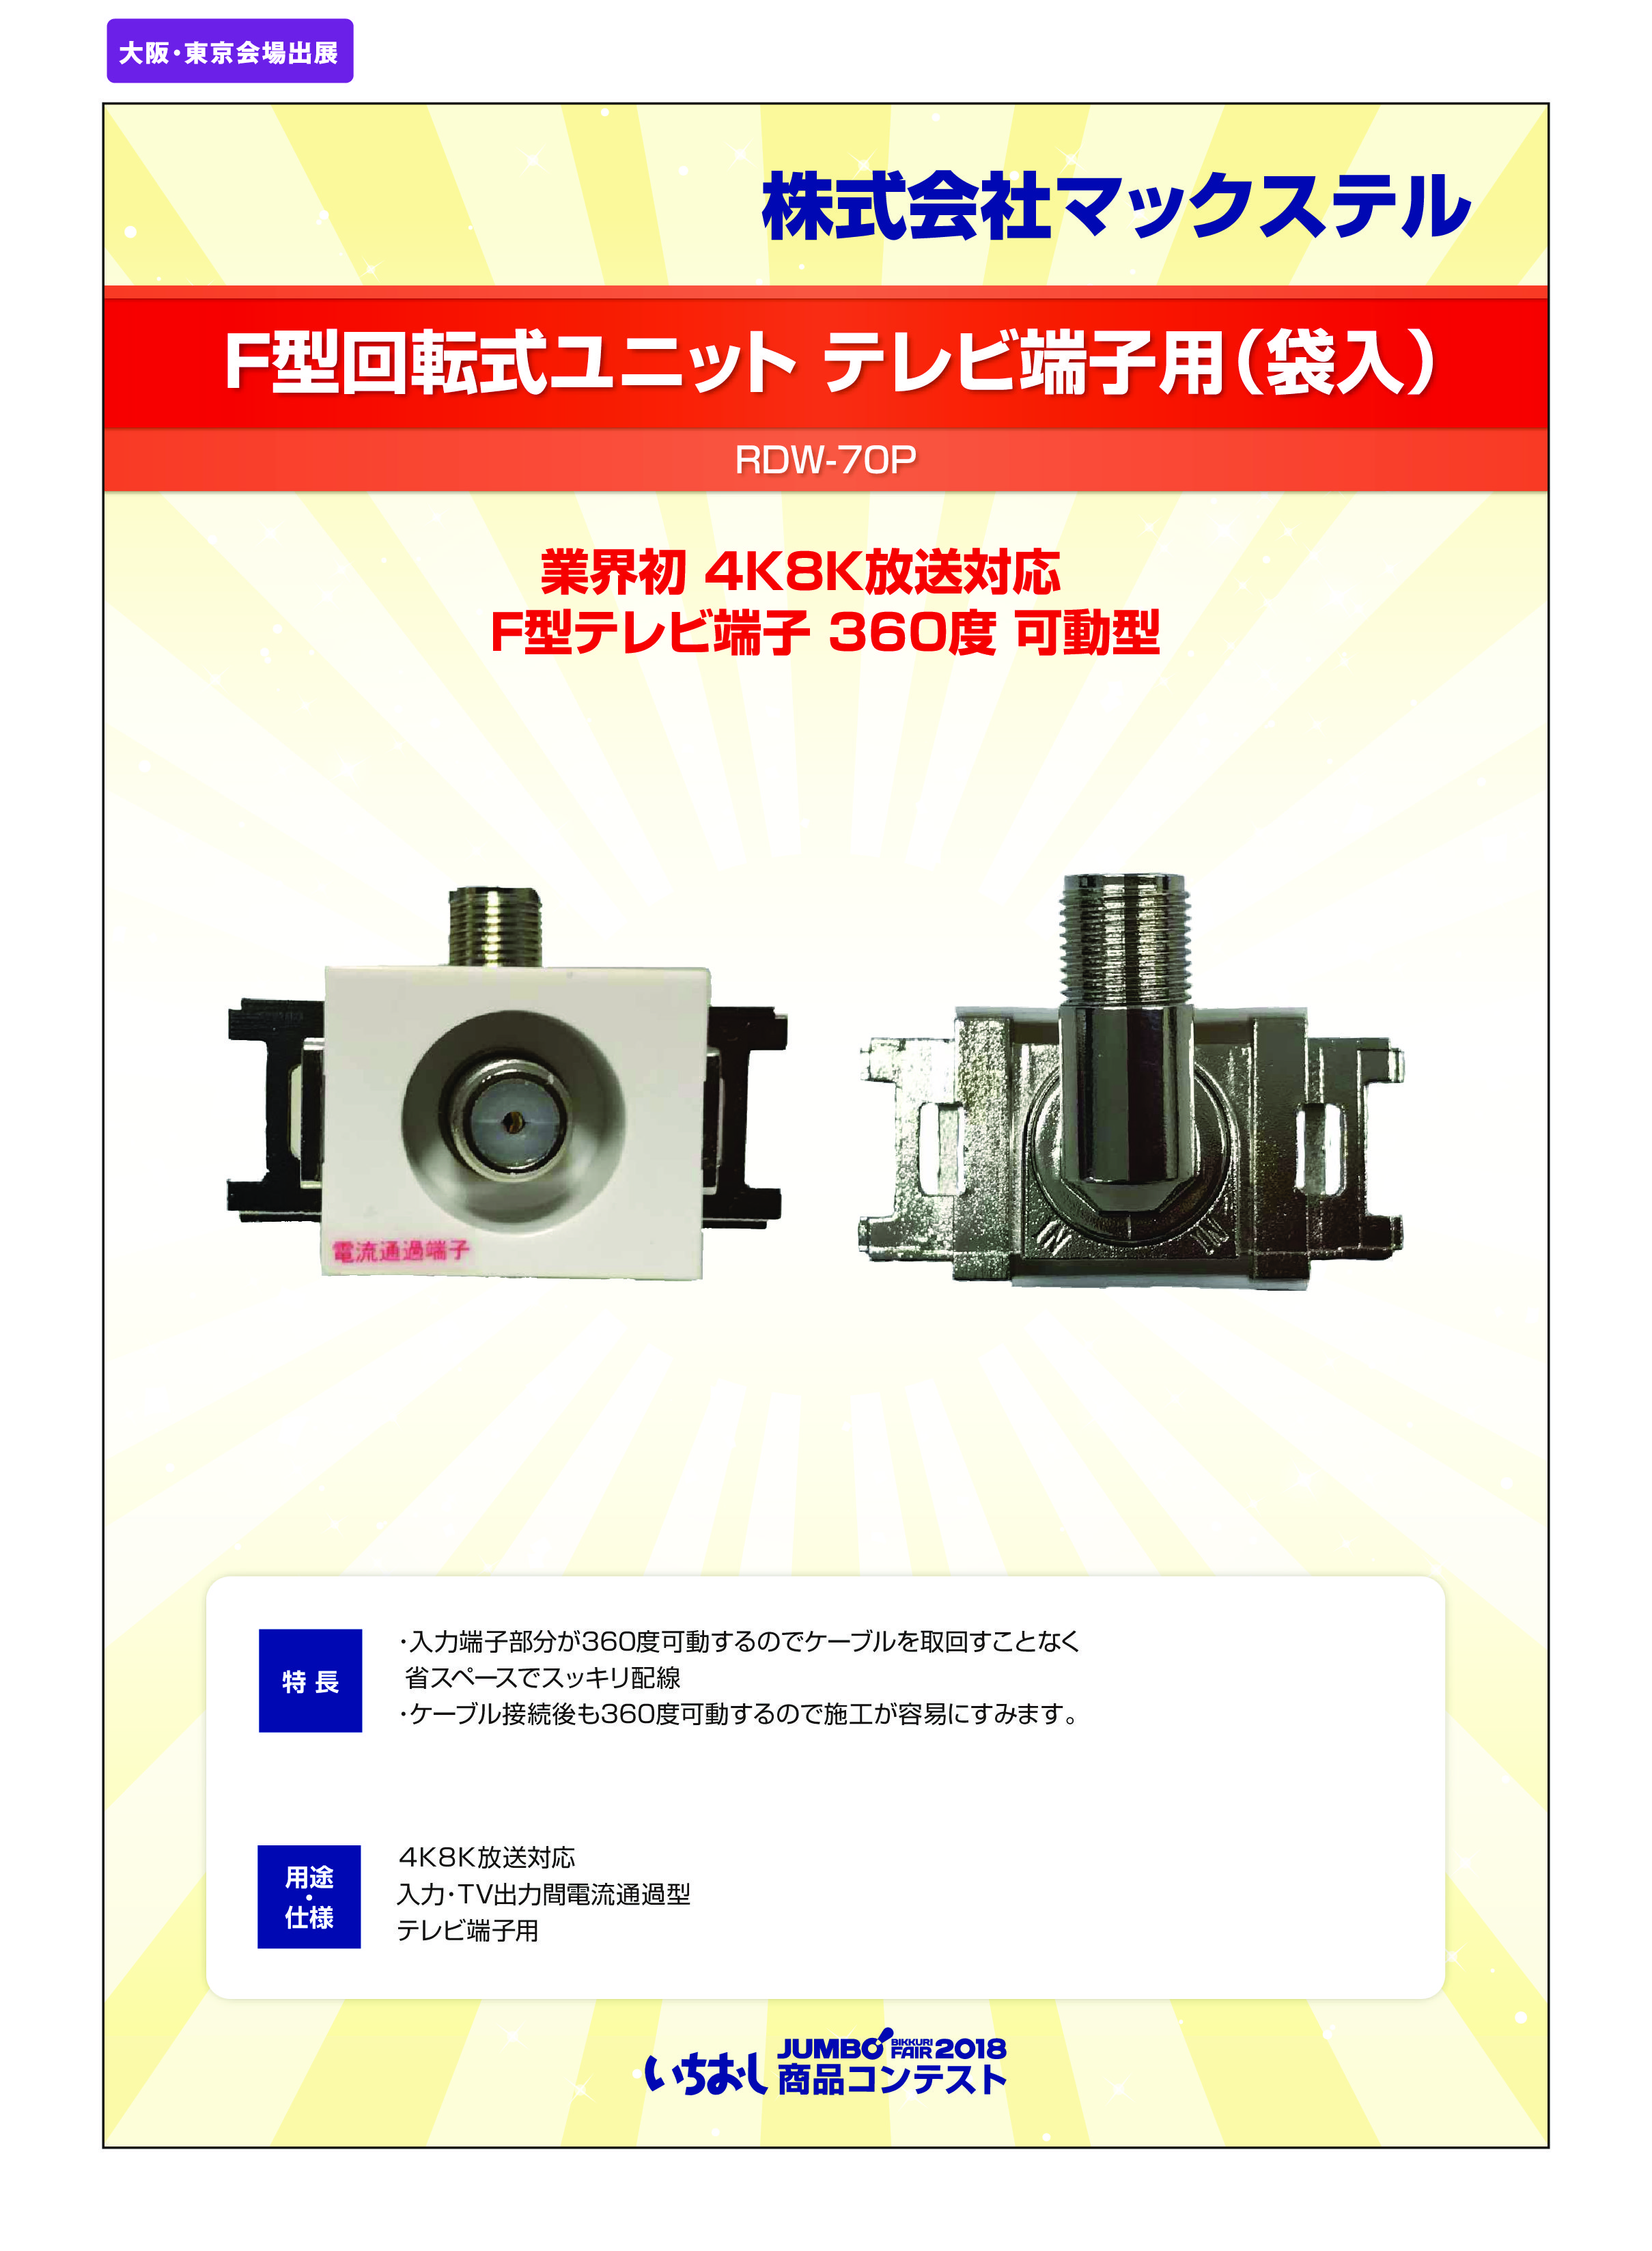 「F型回転式ユニット テレビ端子用(袋入)」株式会社マックステルの画像